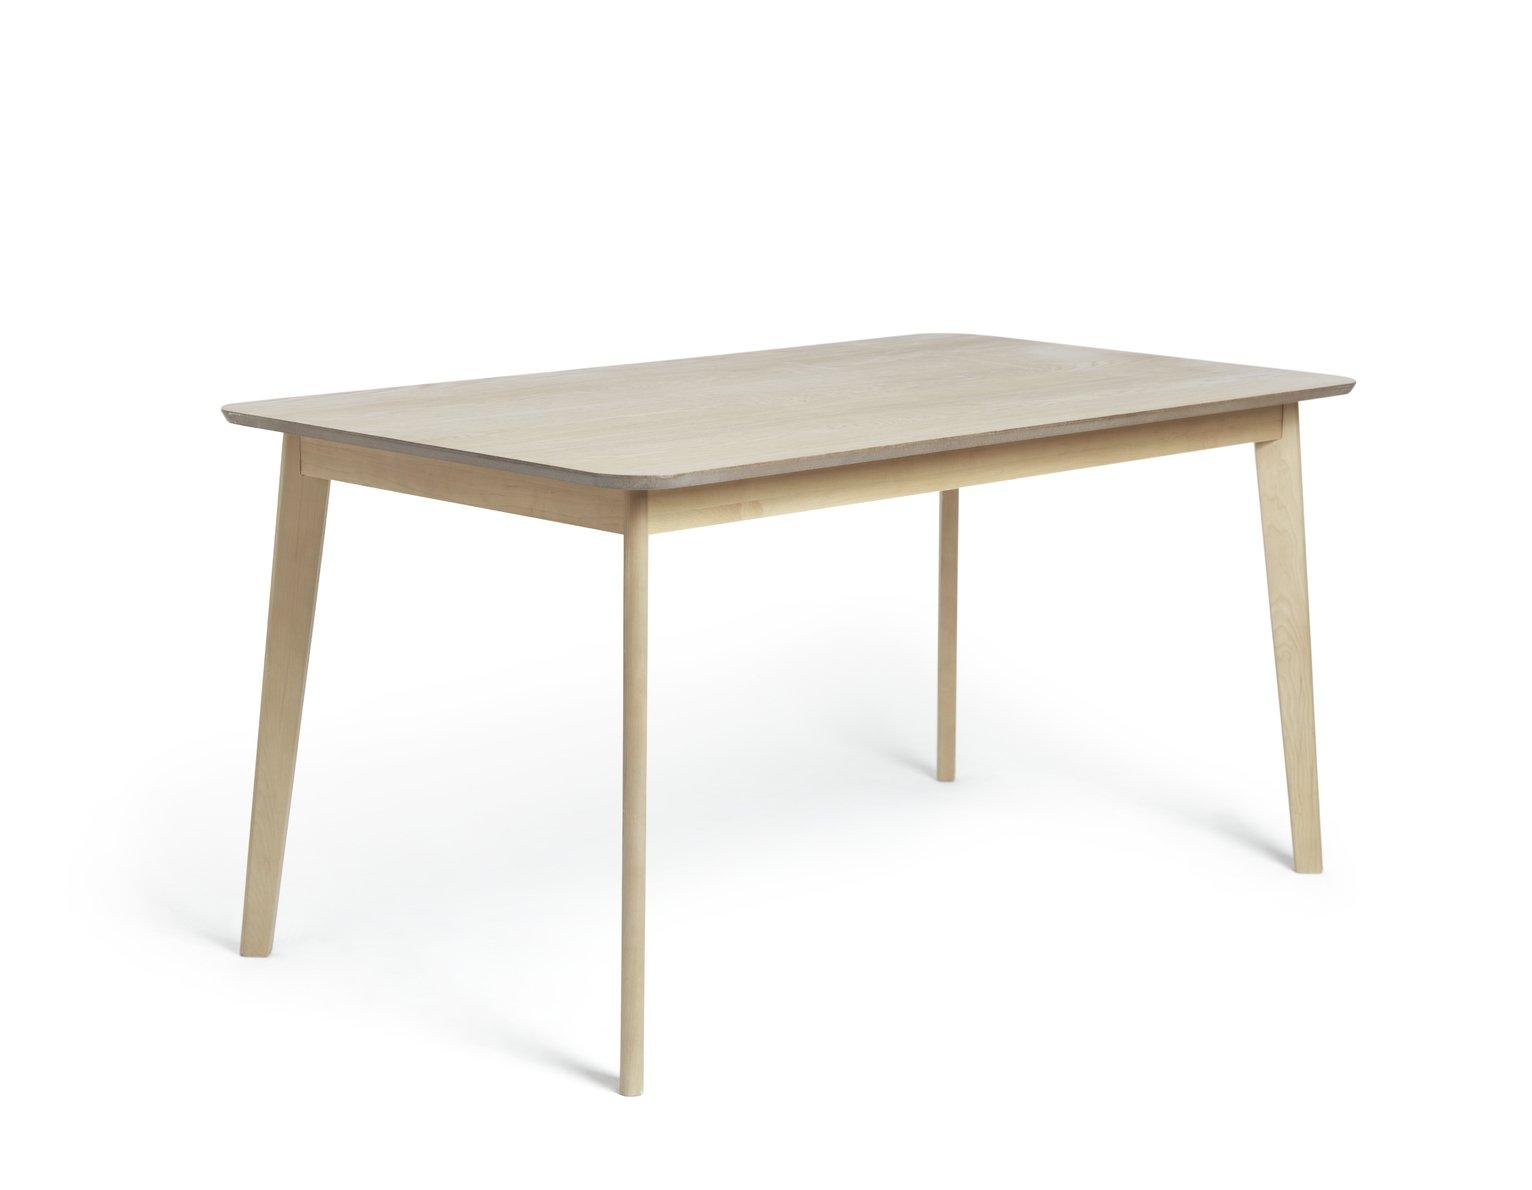 Habitat Skandi Wood Dining Table and 4 Beni Grey Chairs